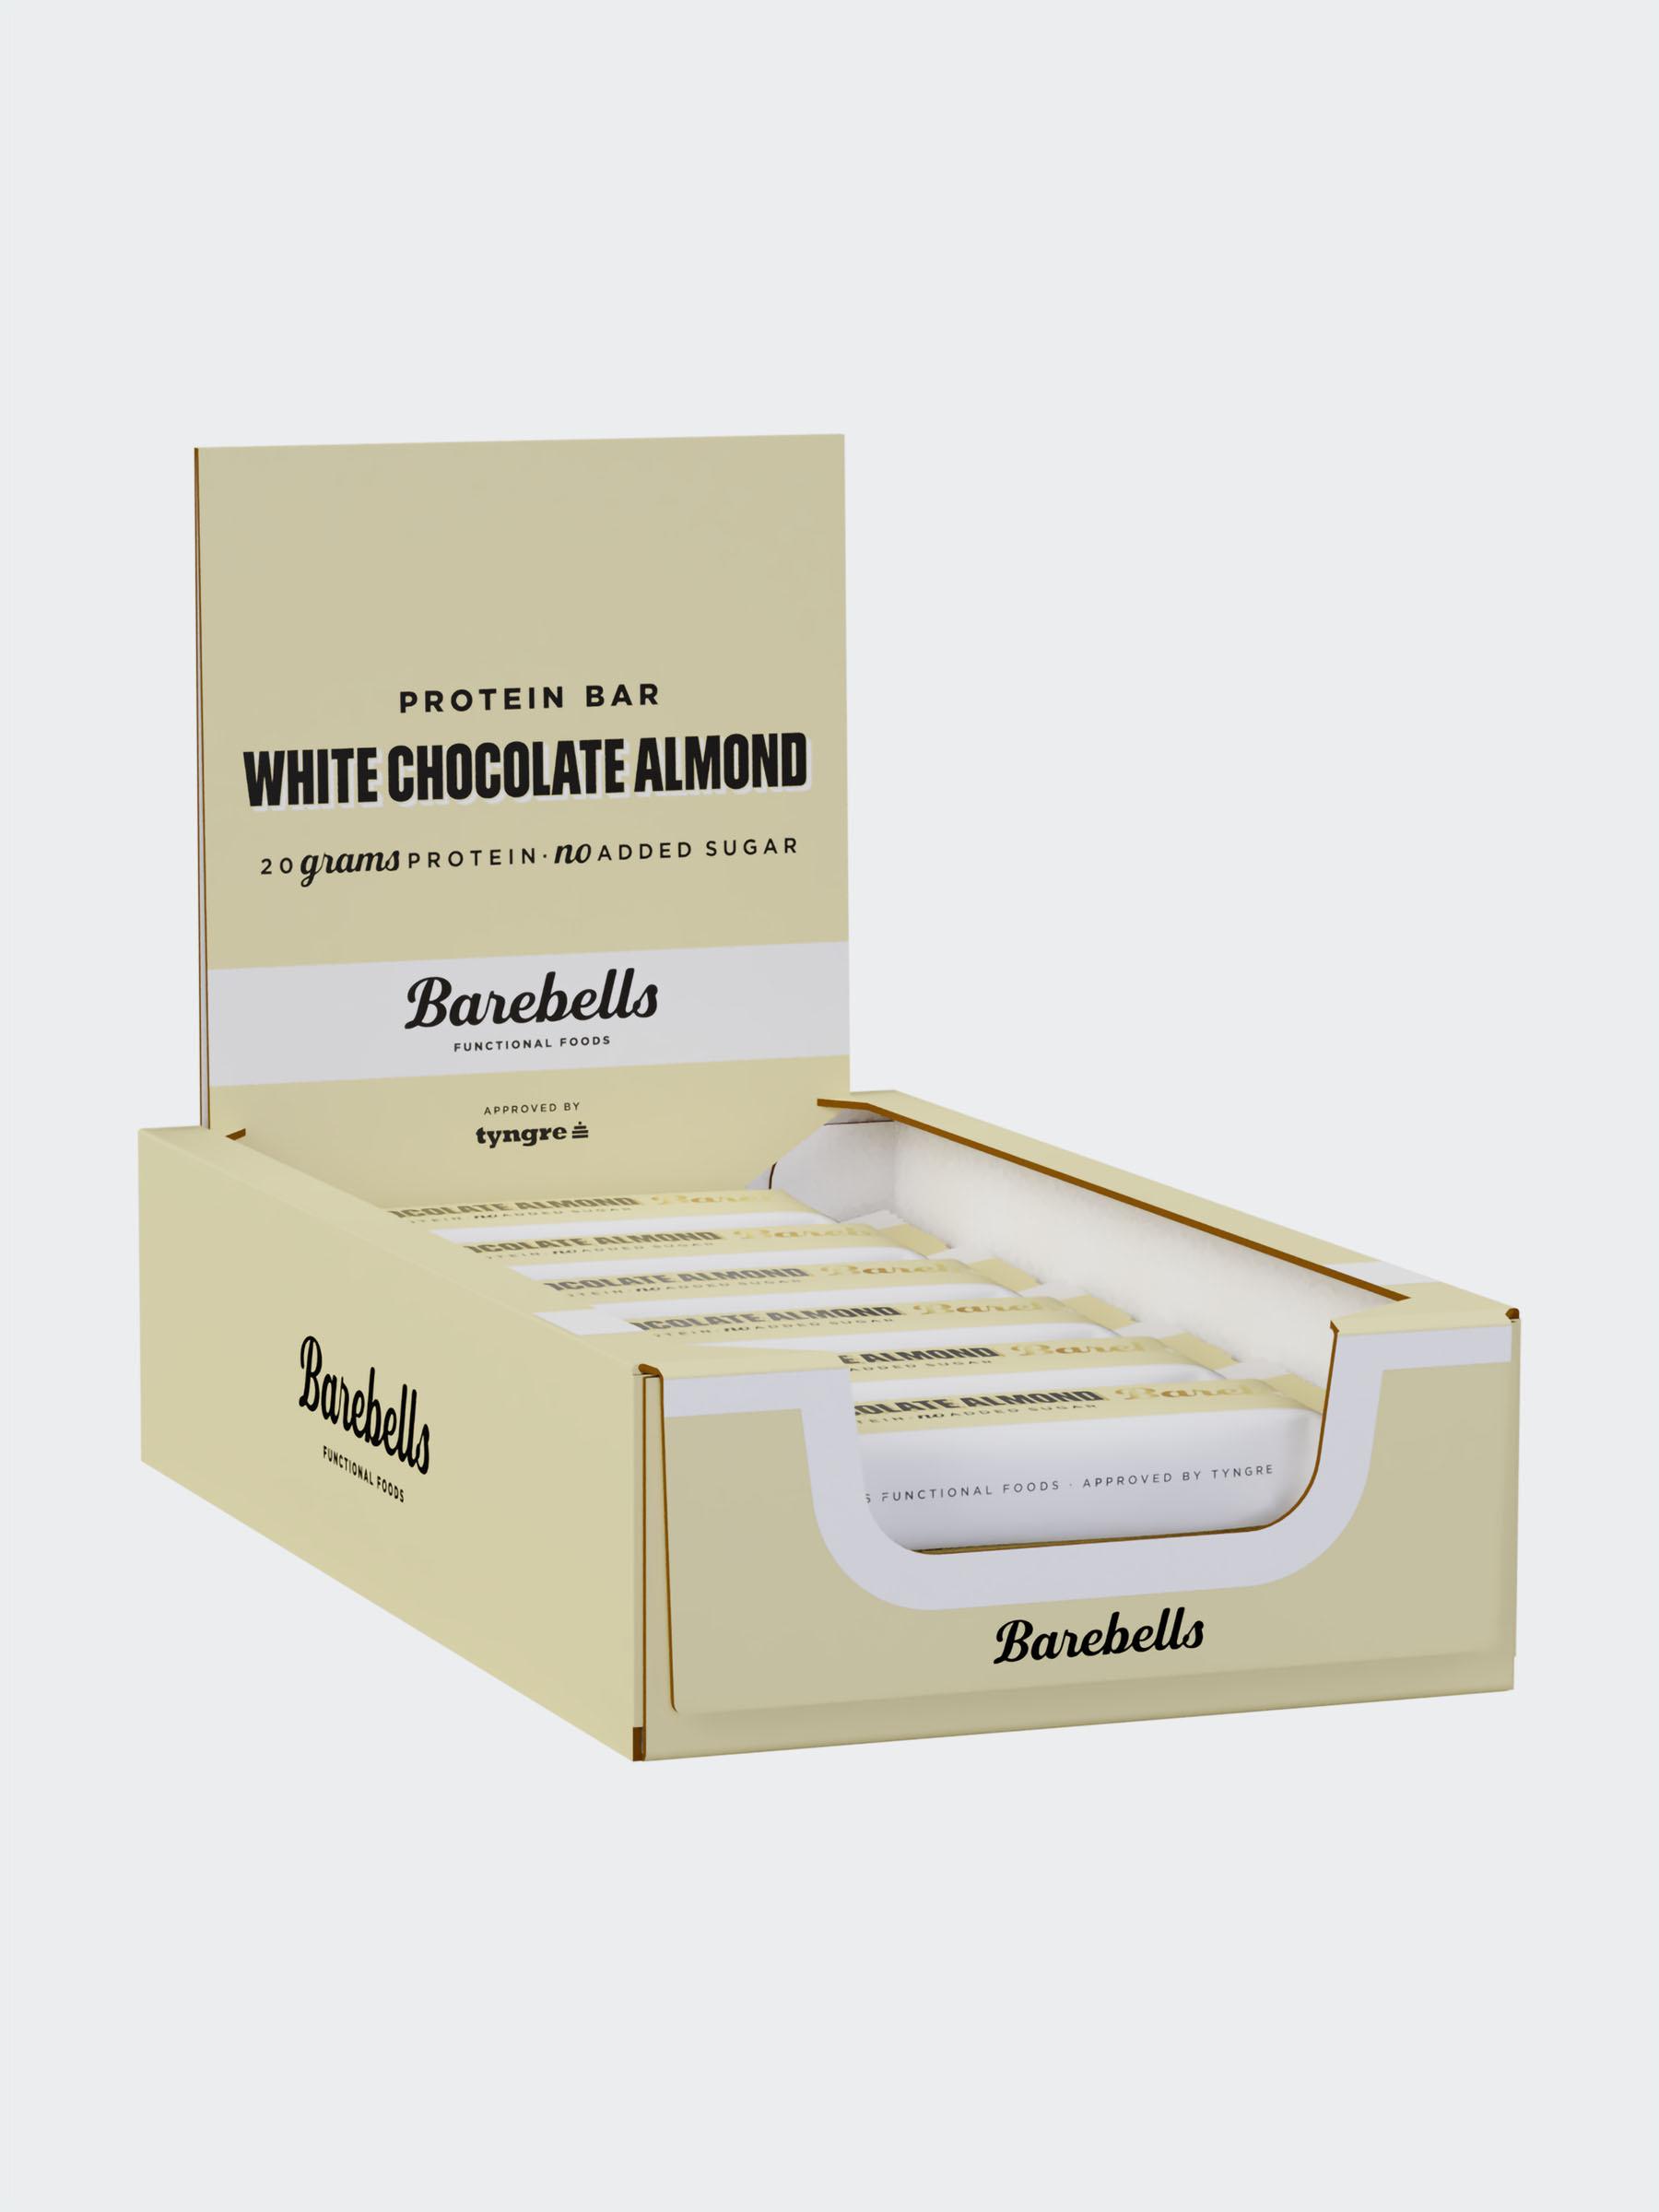 Barebells White Chocolate Almond 12-pack